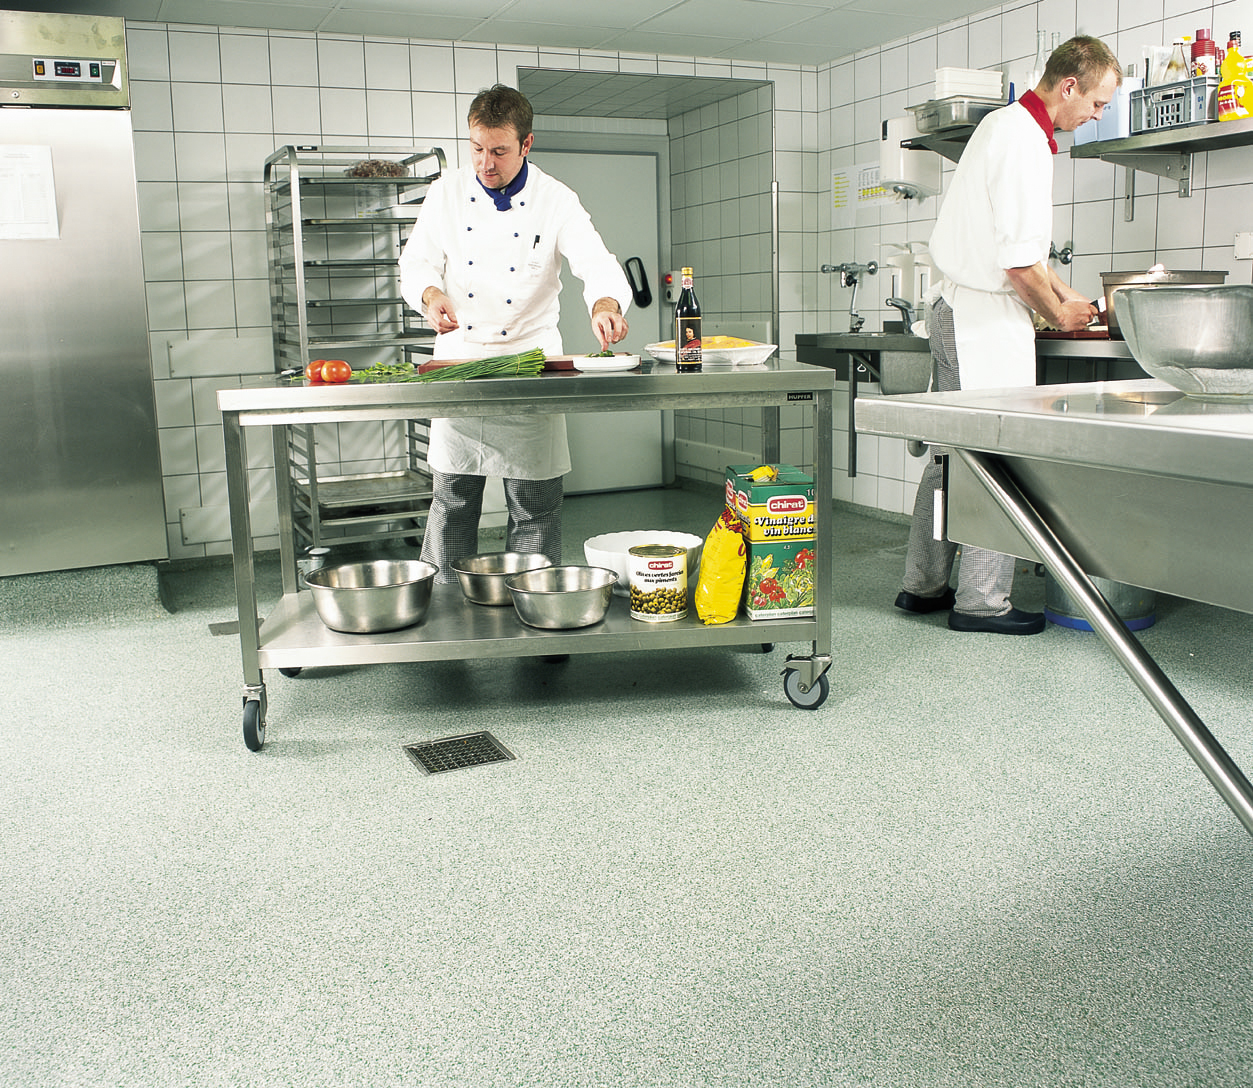 types of kitchen flooring types of kitchen flooring Flake type of kitchen flooring with chefs cooking